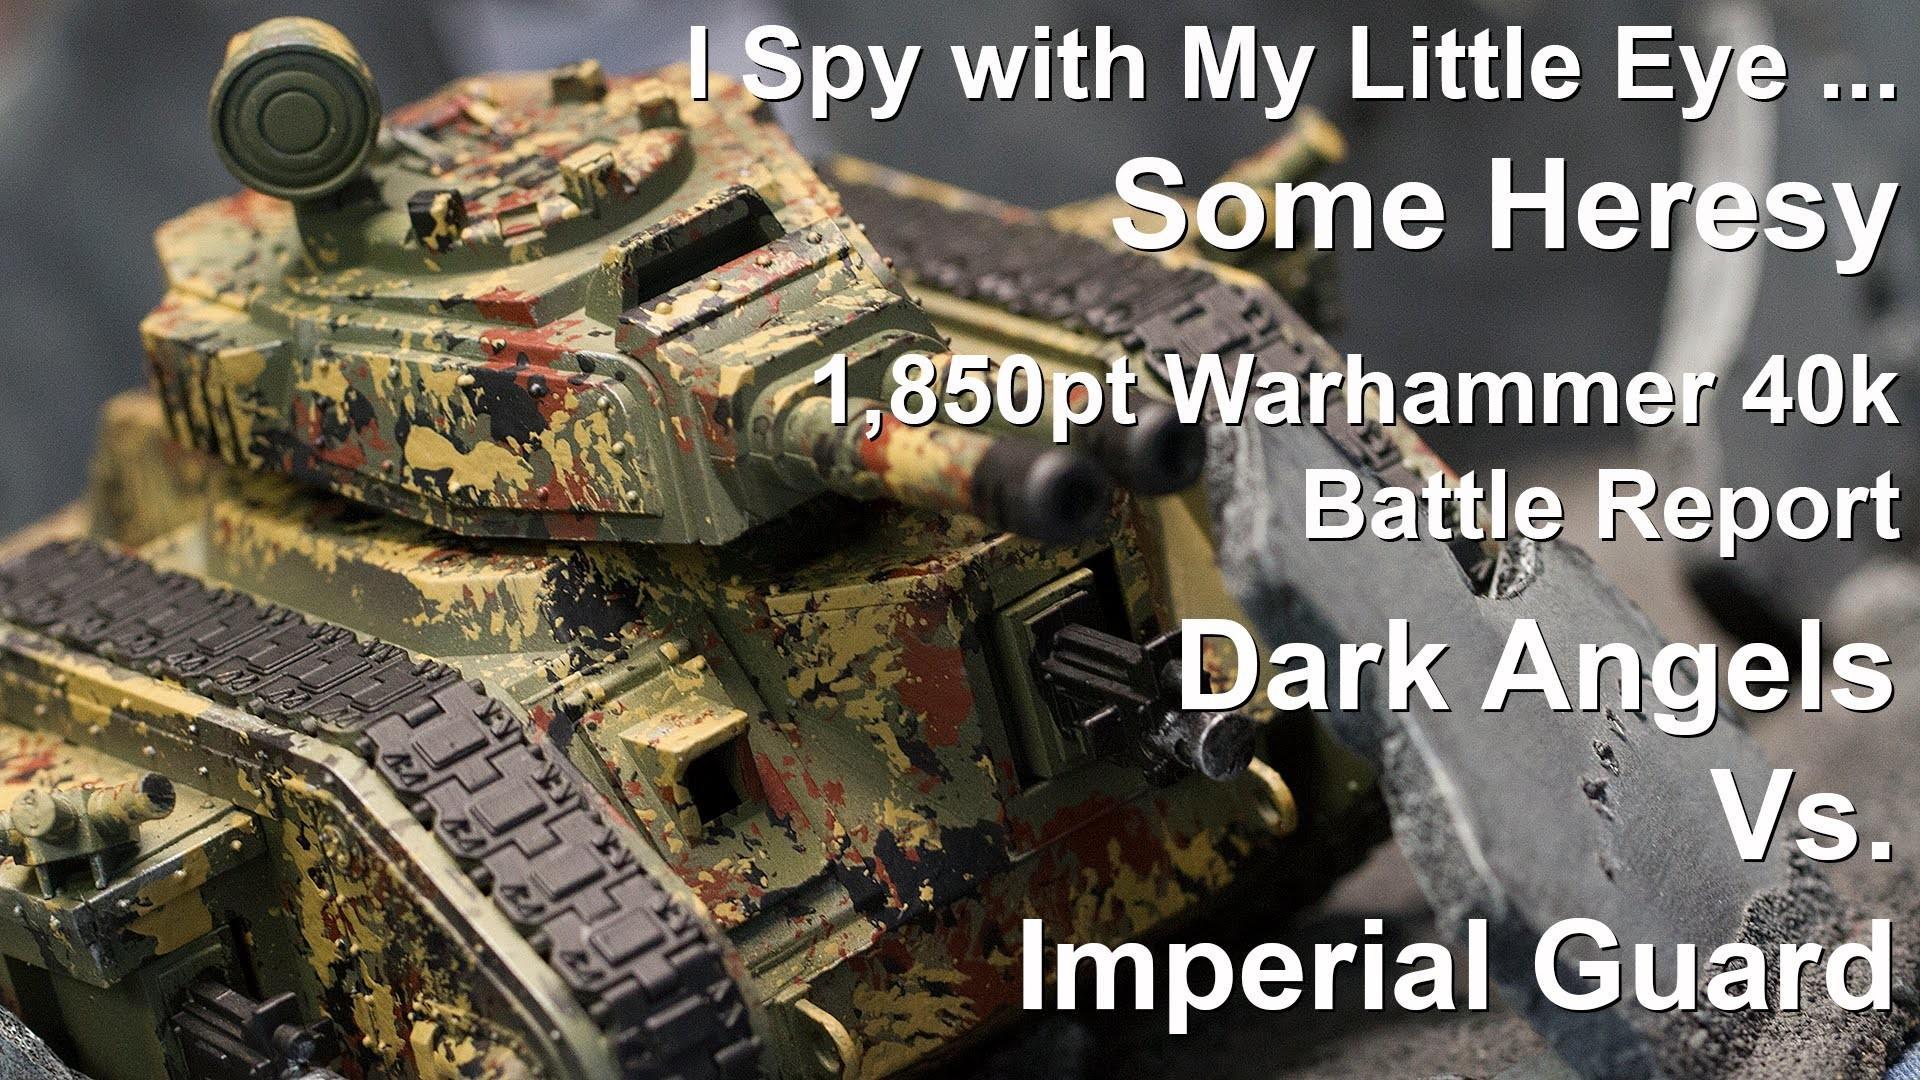 Heresy – 1,850pt Warhammer 40K Battle Report – Imperial Guard Vs. Dark  Angels – YouTube